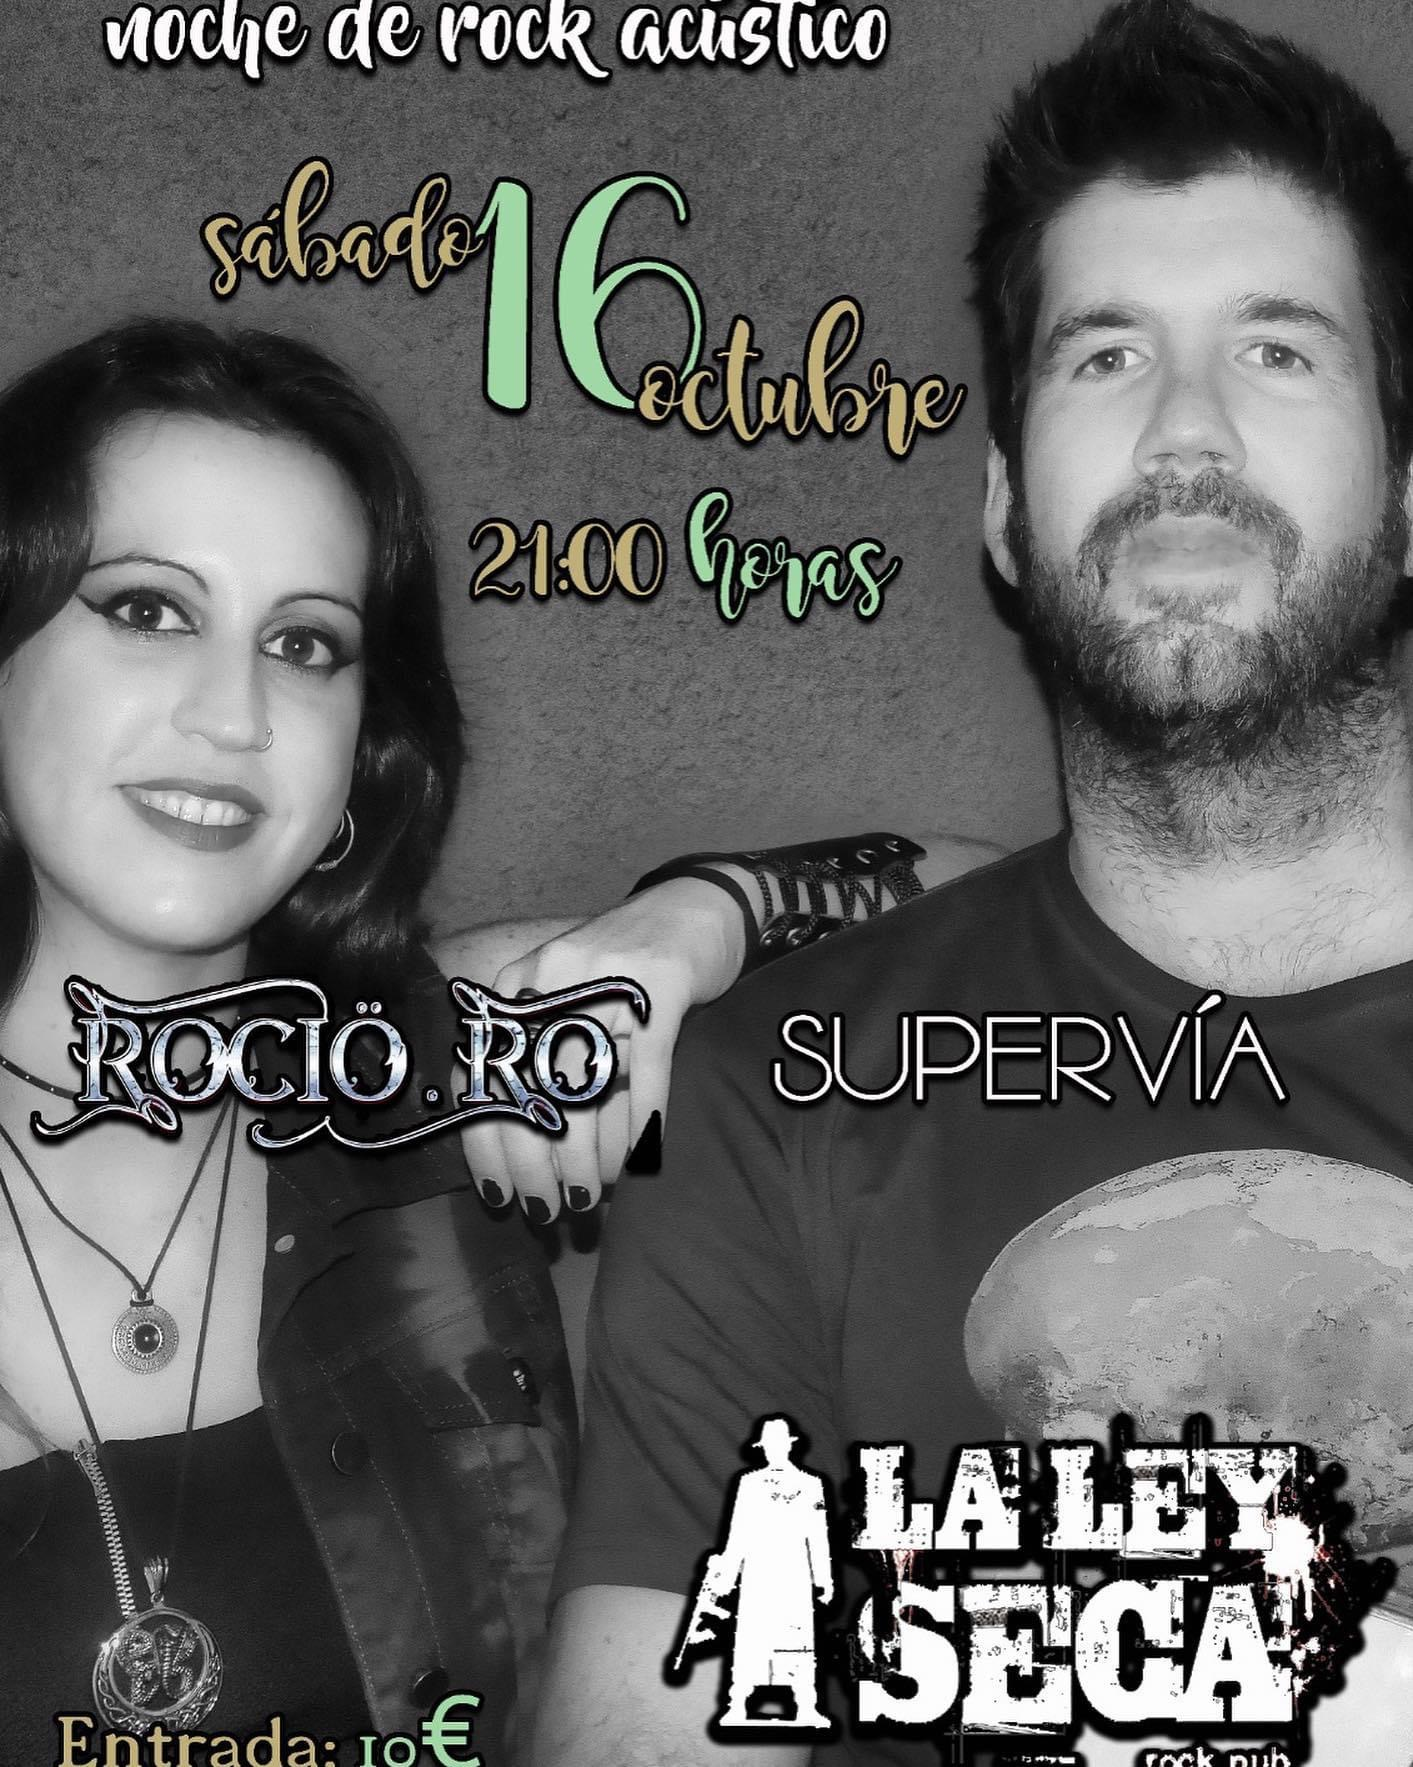 RocioRoSupervia-la-ley-seca-zaragozaj